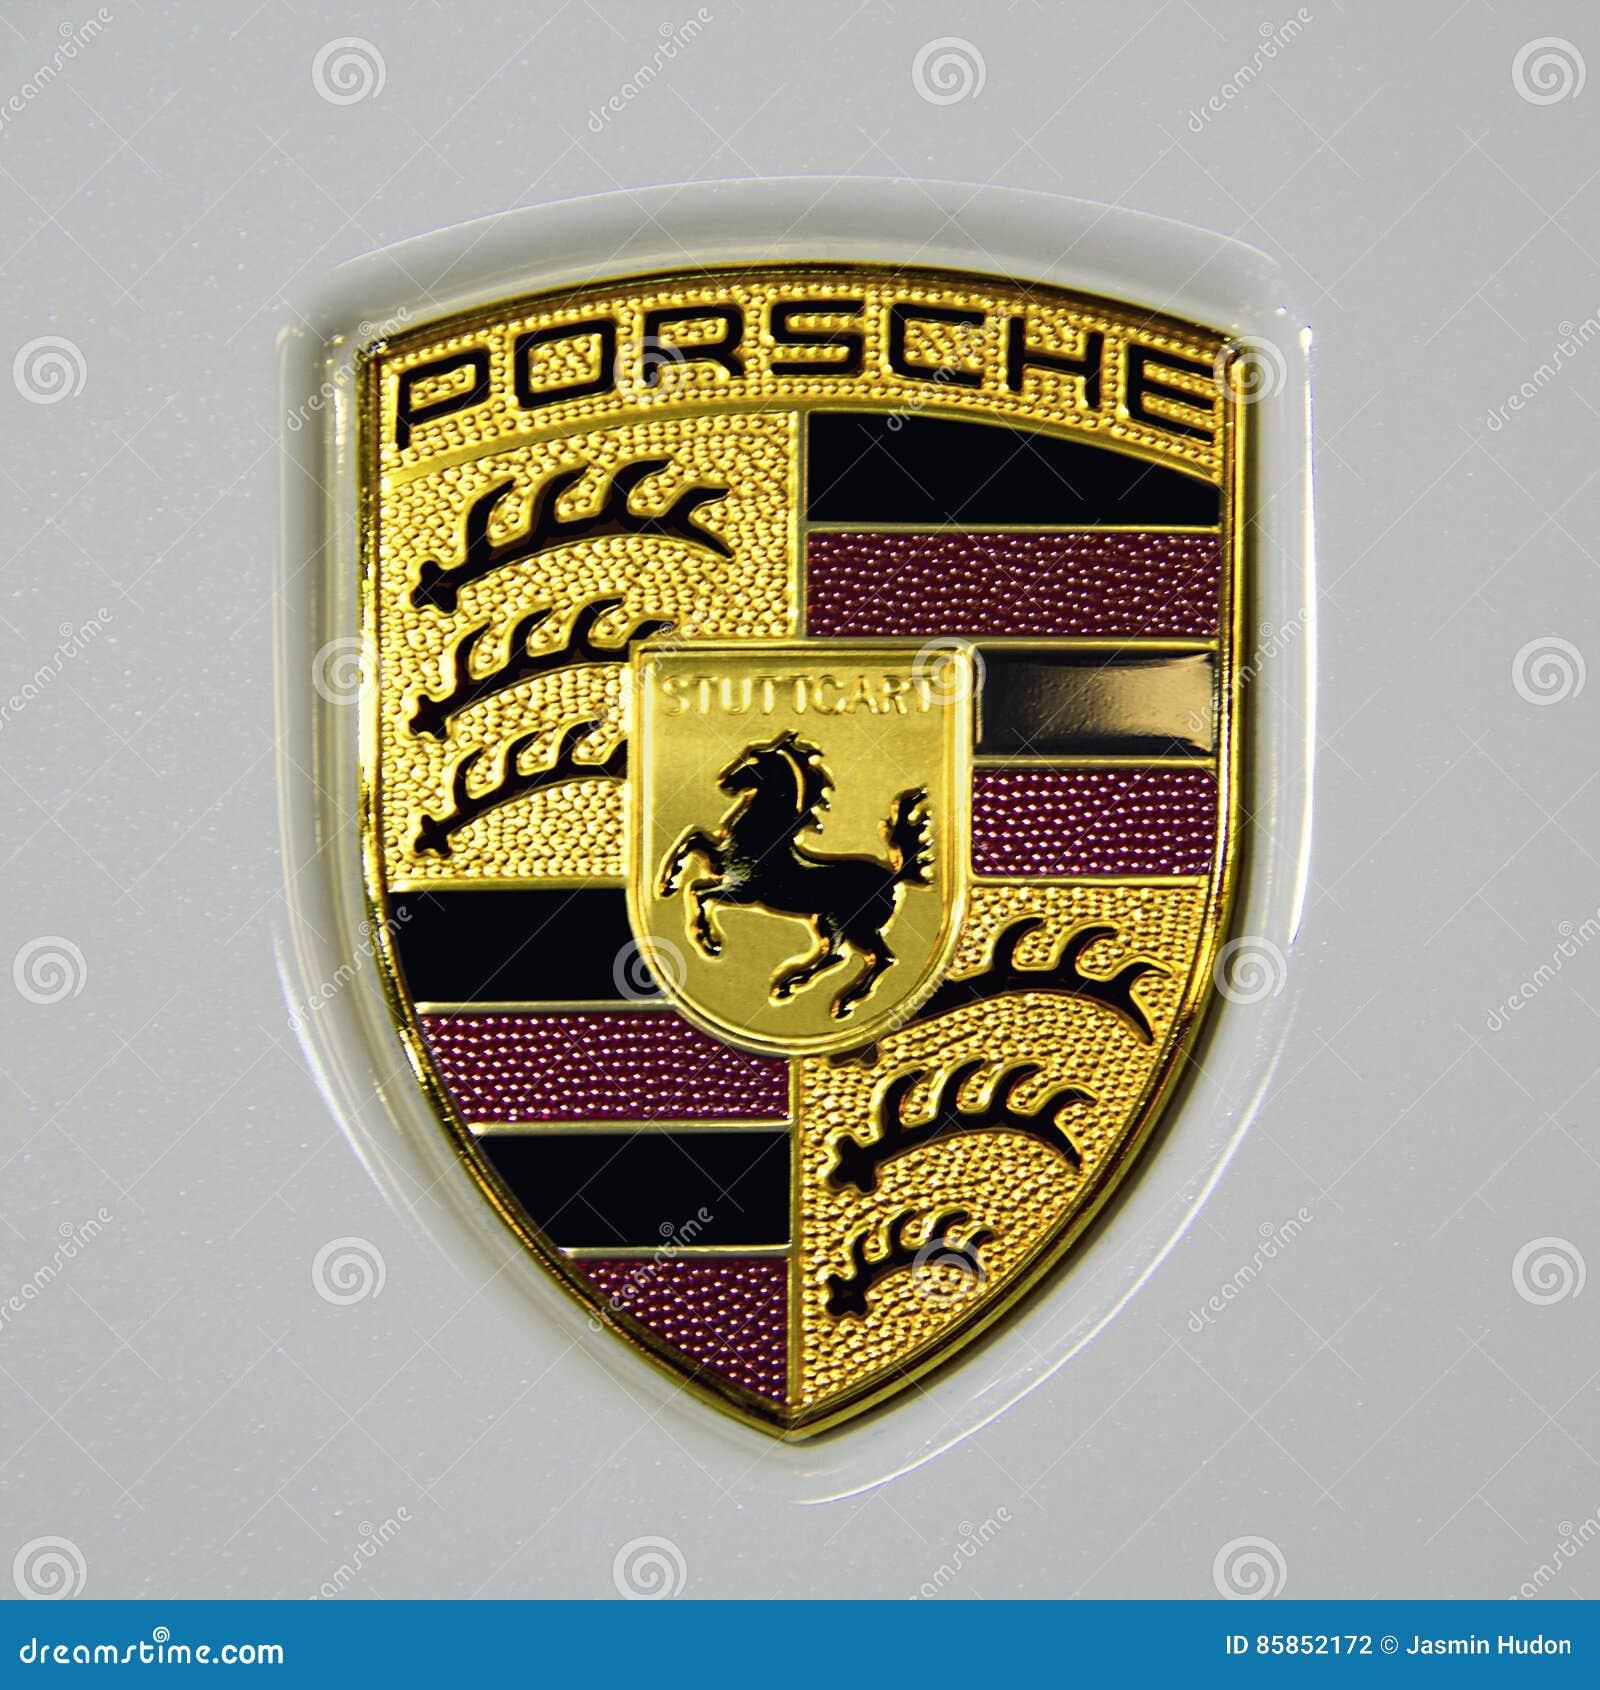 Porsche 911 Turbo S Car Logo Editorial Photography Image Of Montreal Emblem 85852172